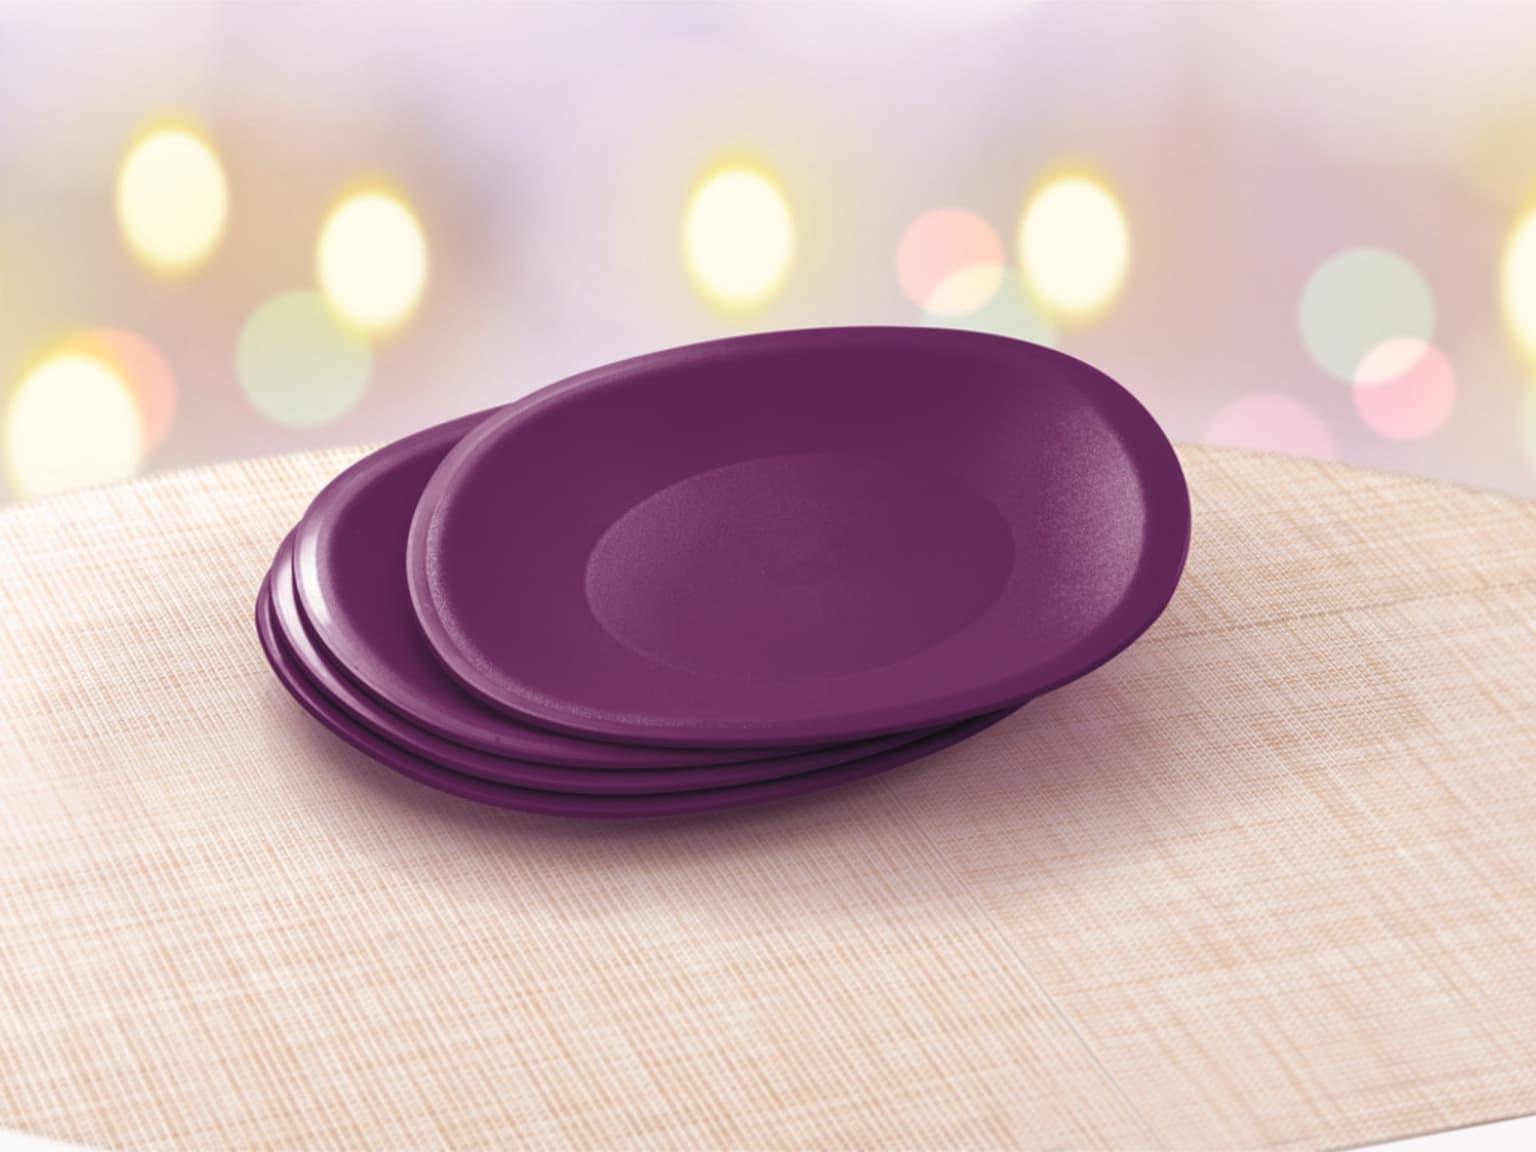 Lady Lavender Microwaveable Plates